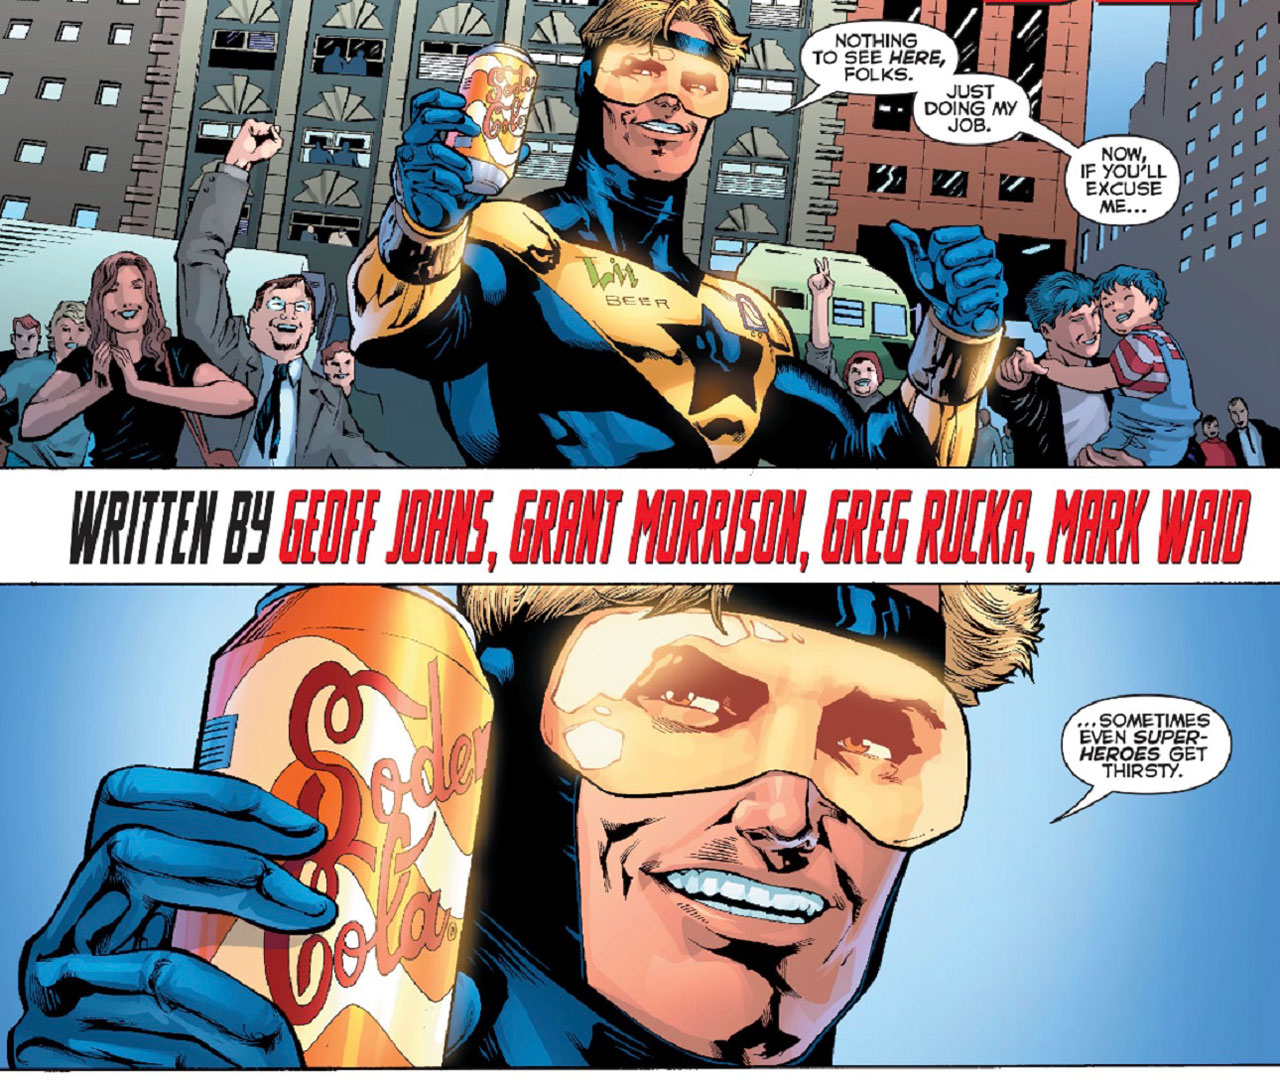 Soder-Cola-DC-Comics-Booster-Gold.jpg